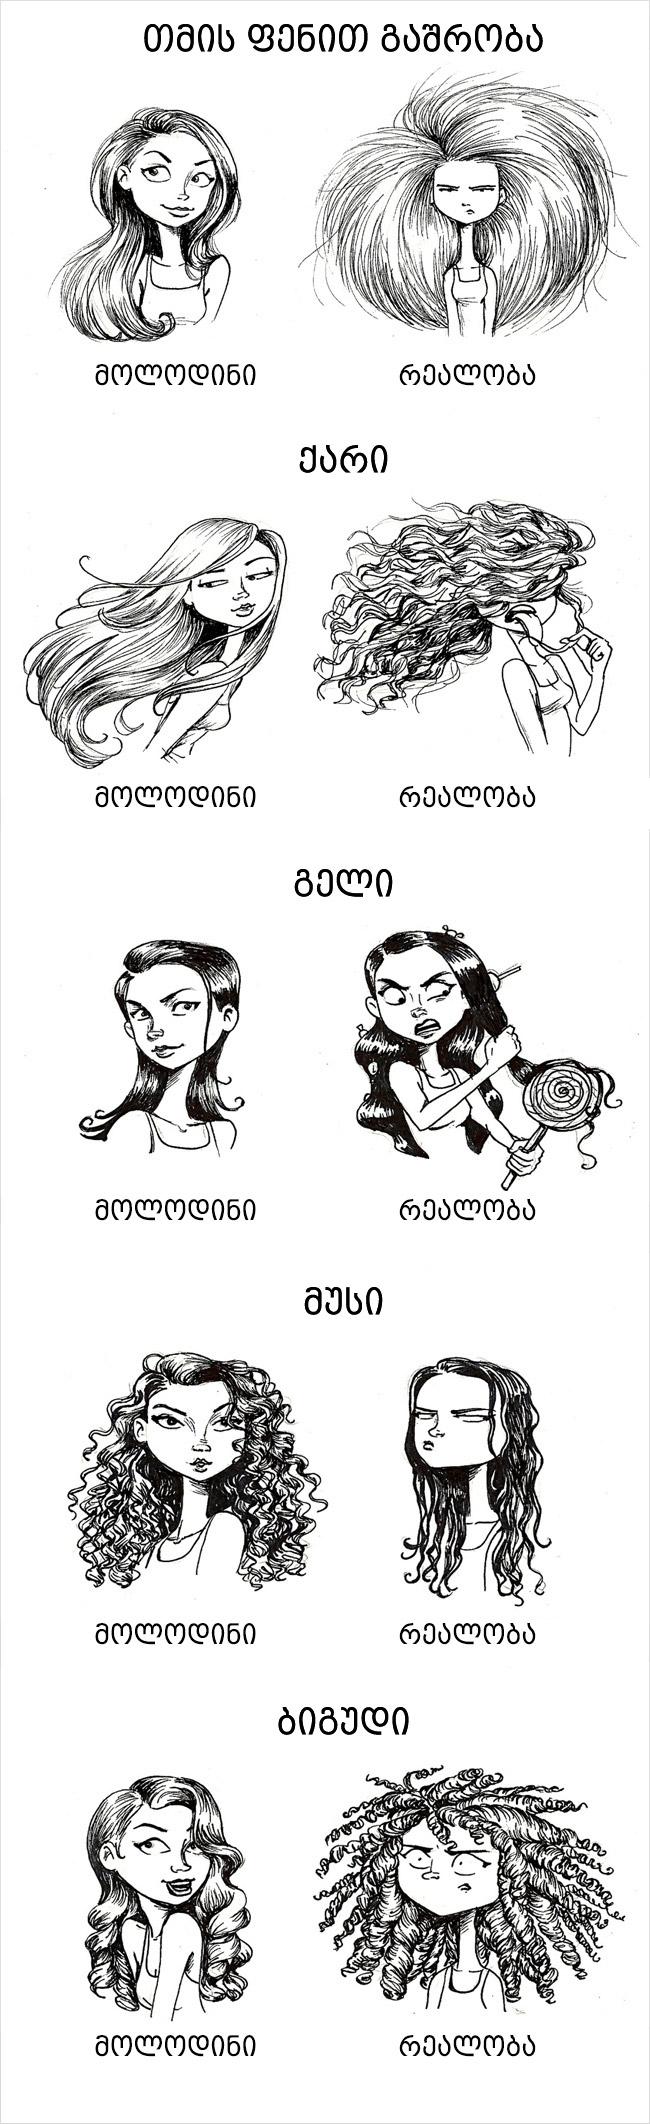 modern_girls_everyday_problems_6